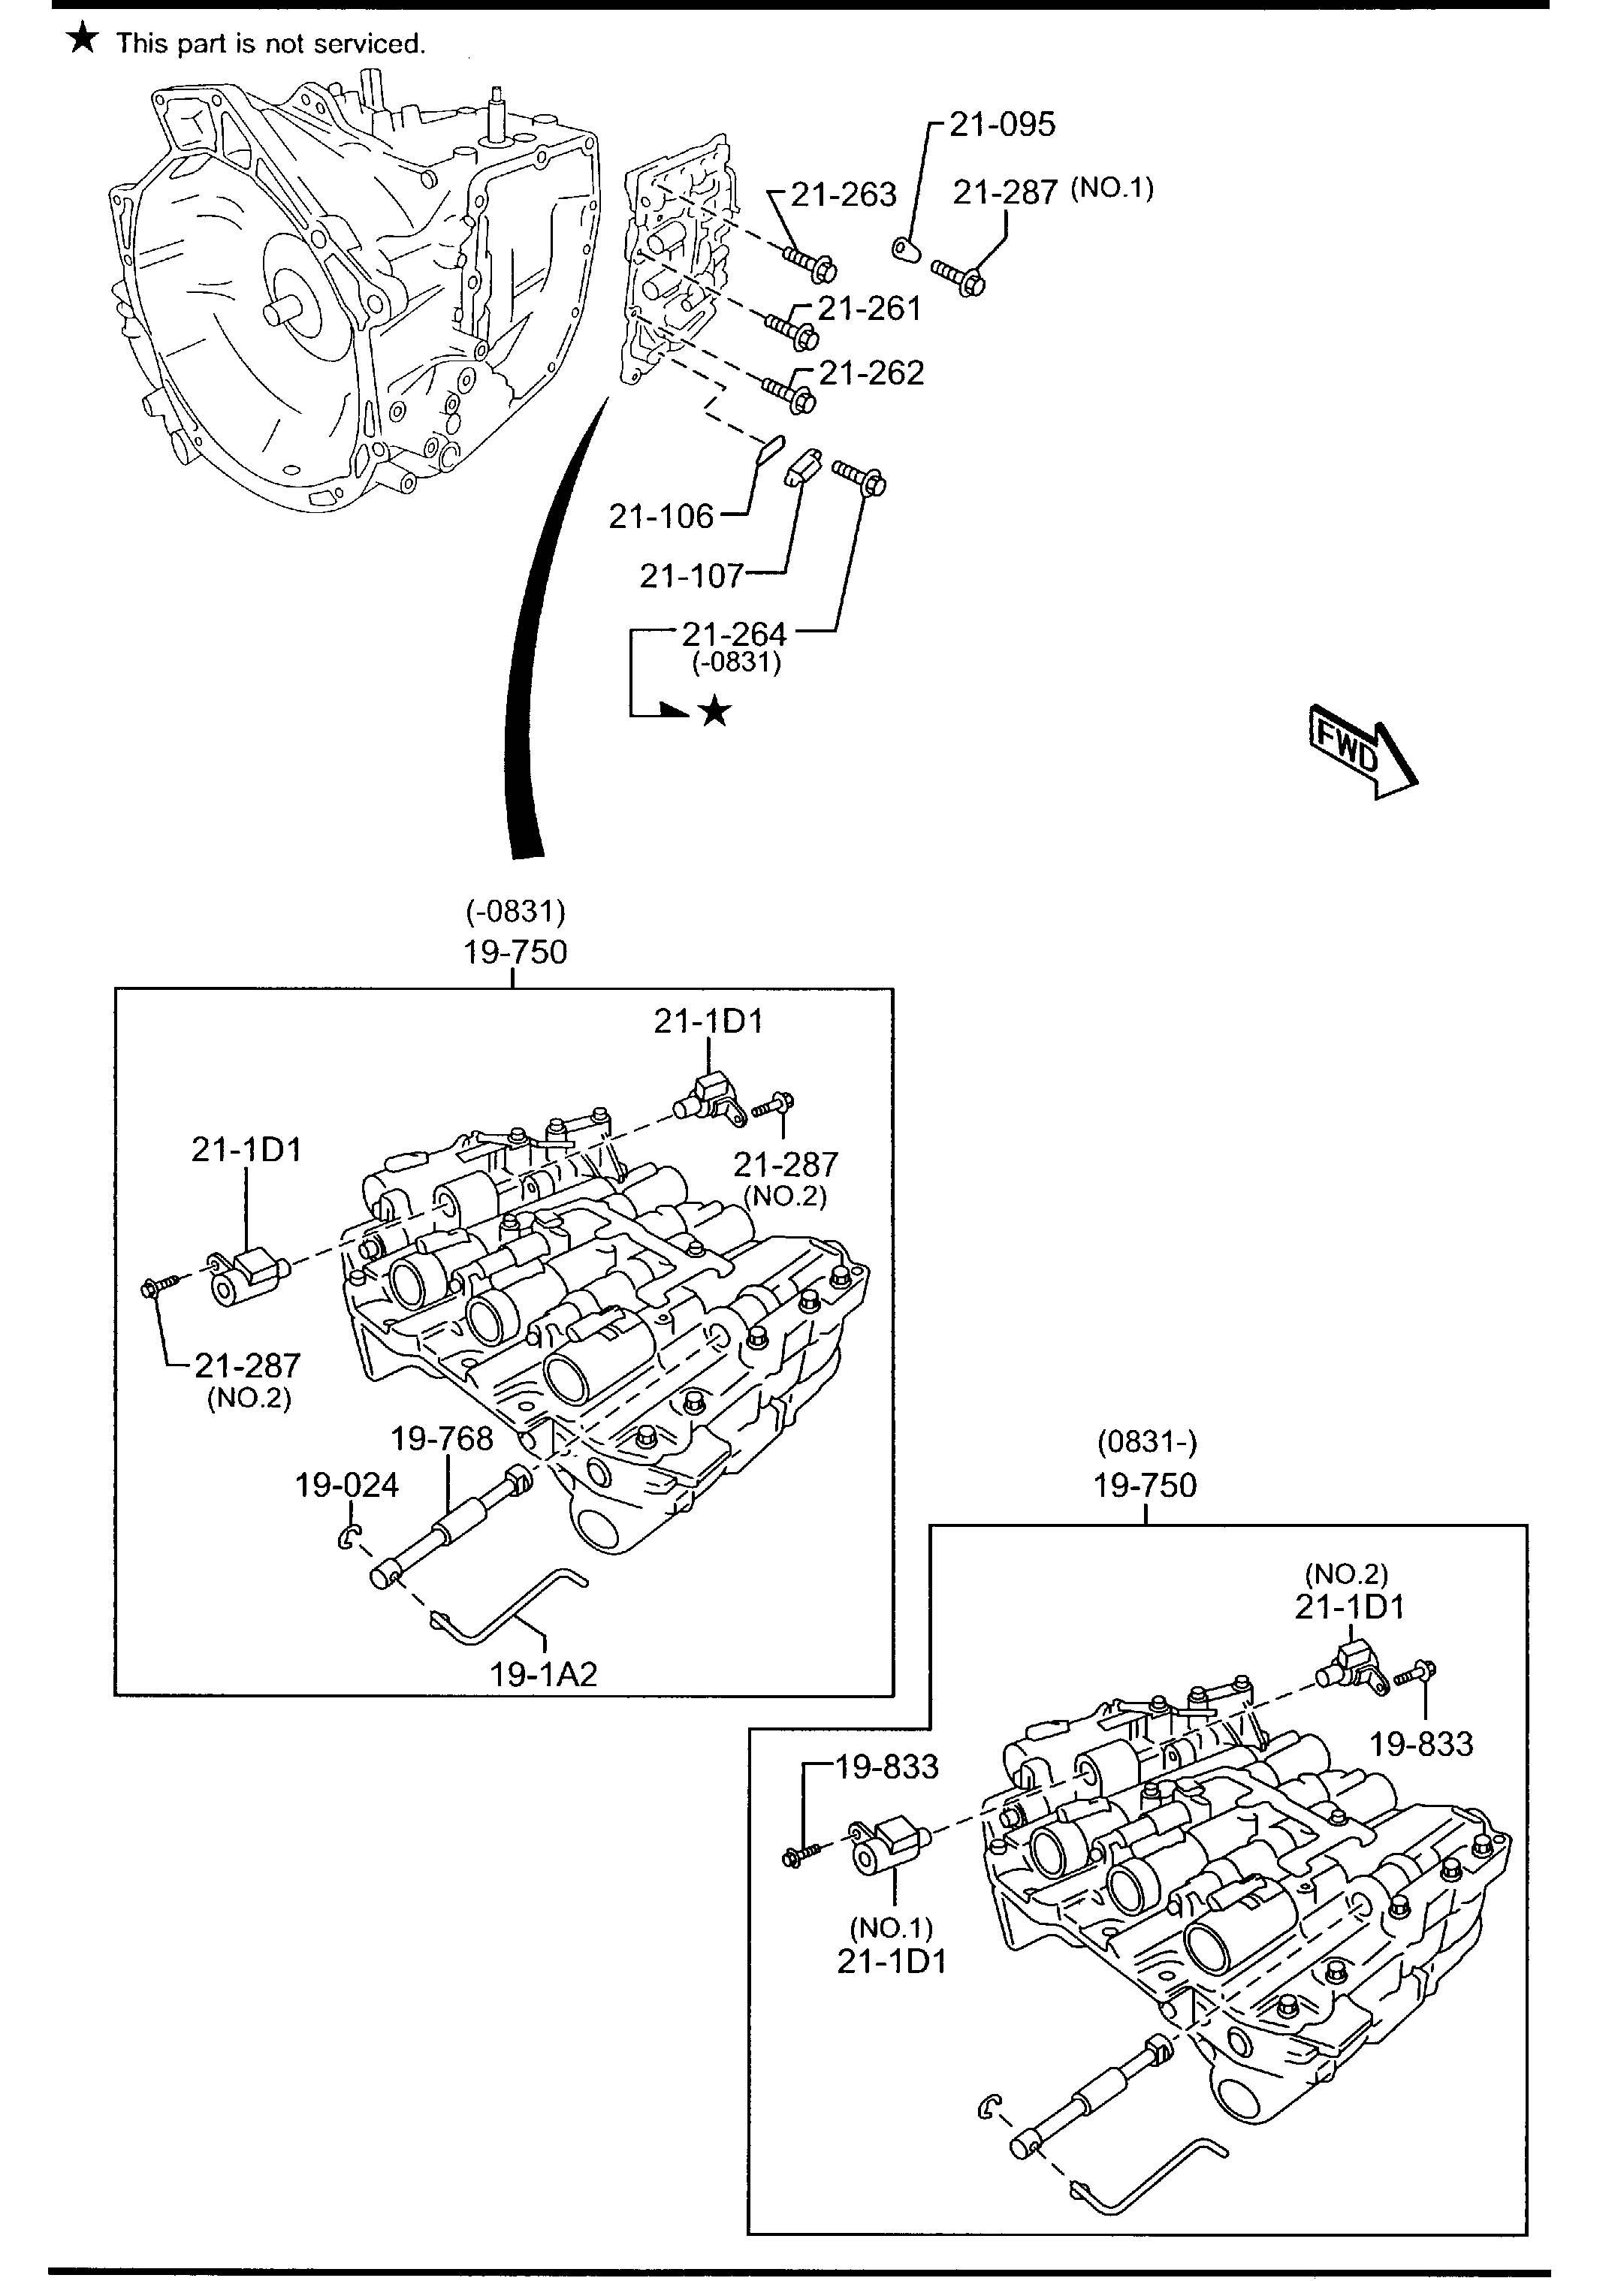 700r4 4x4 transmission diagram john deere 317 skid steer wiring vacuum line and fuse box